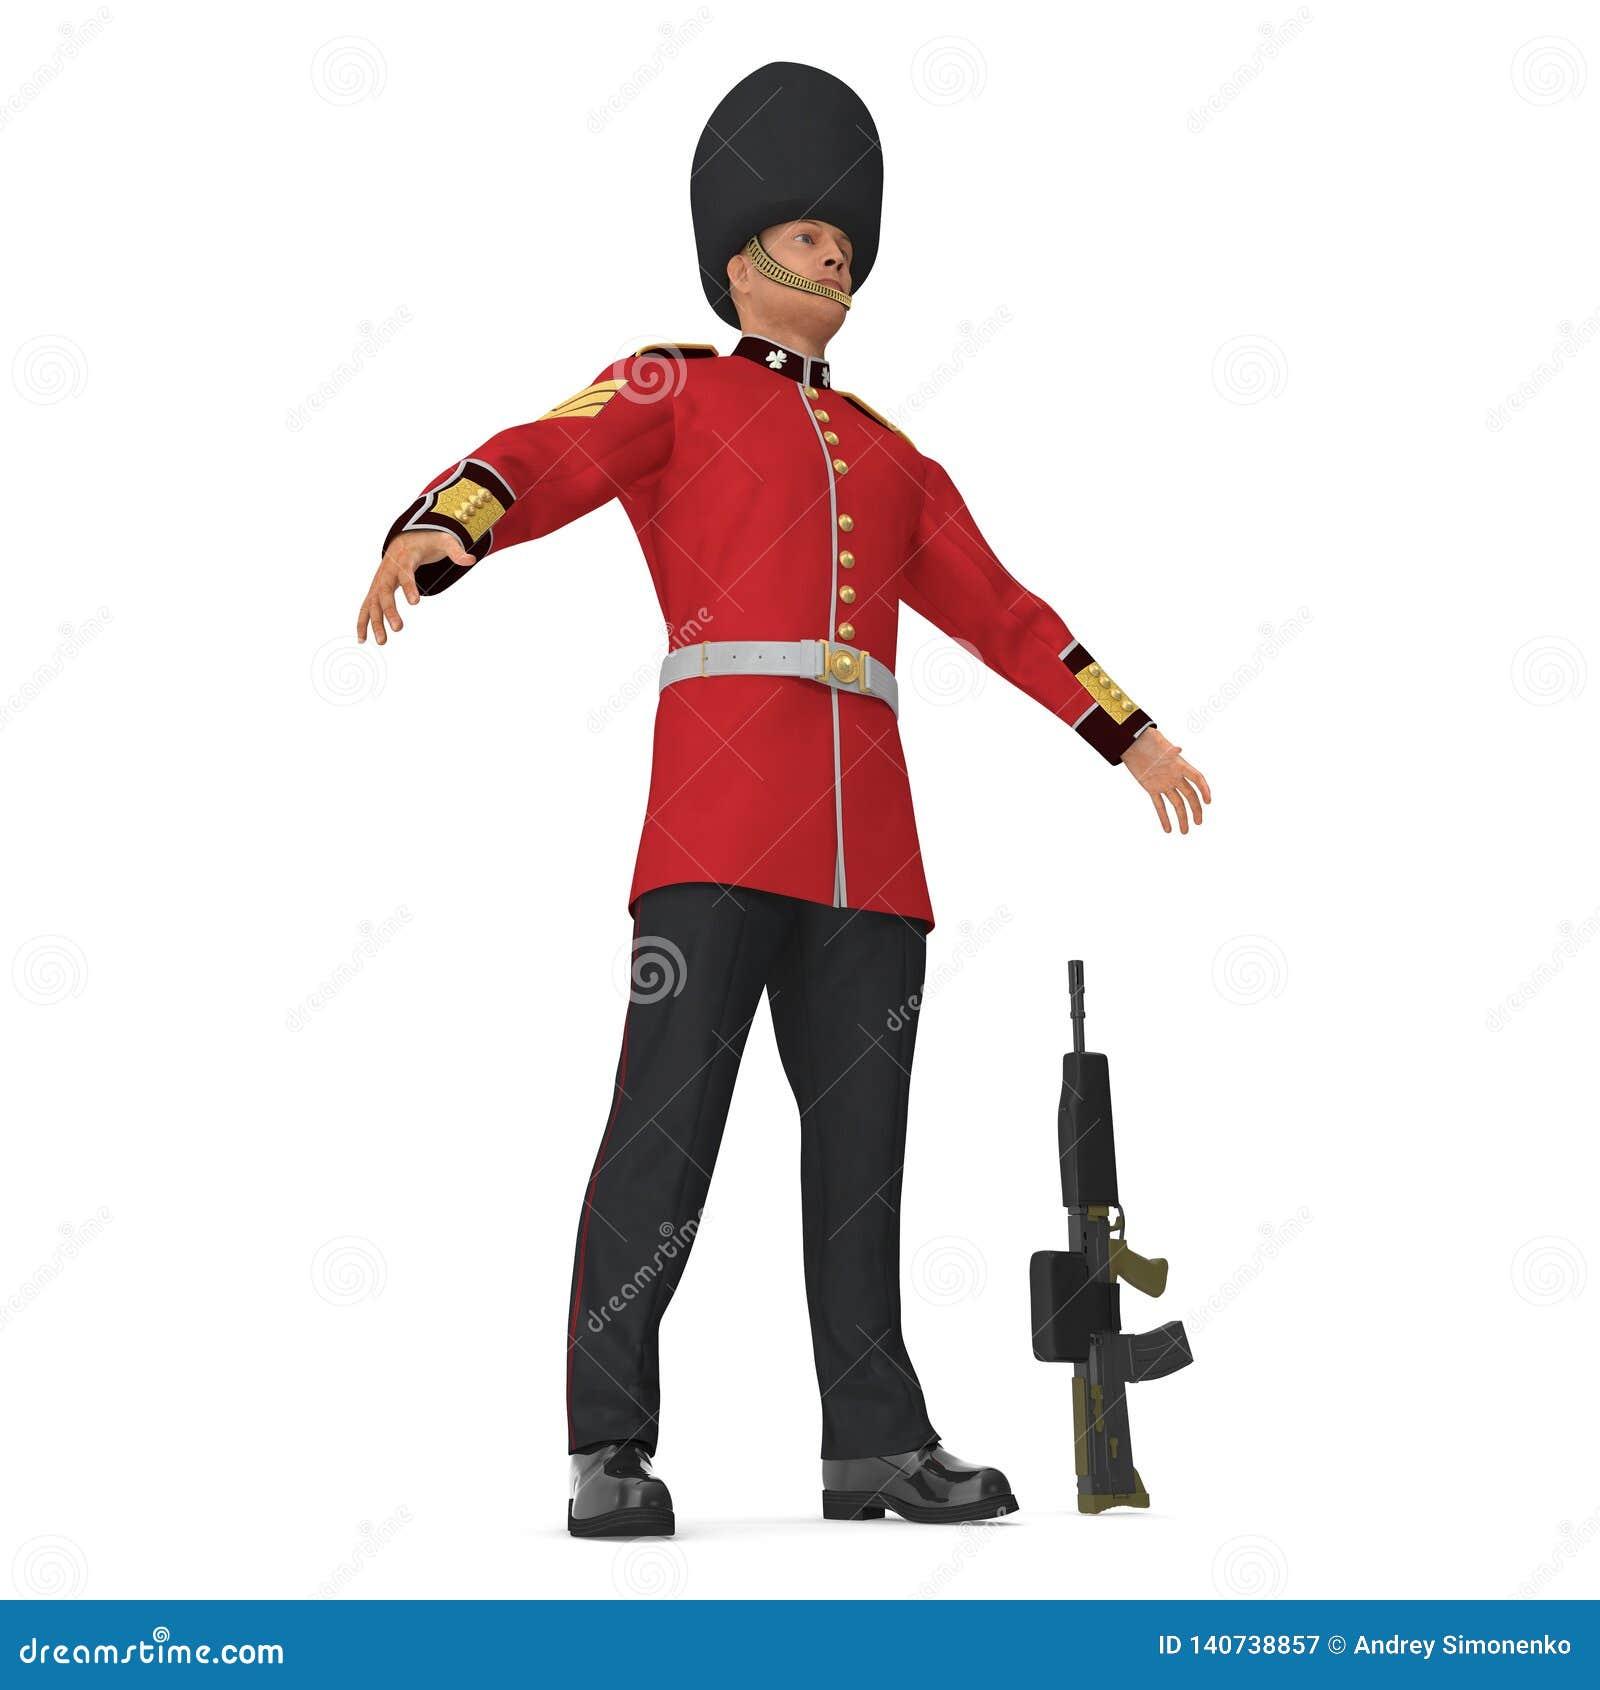 Soldat Royal Britannique Standing Pose Isolated De Garde Sur